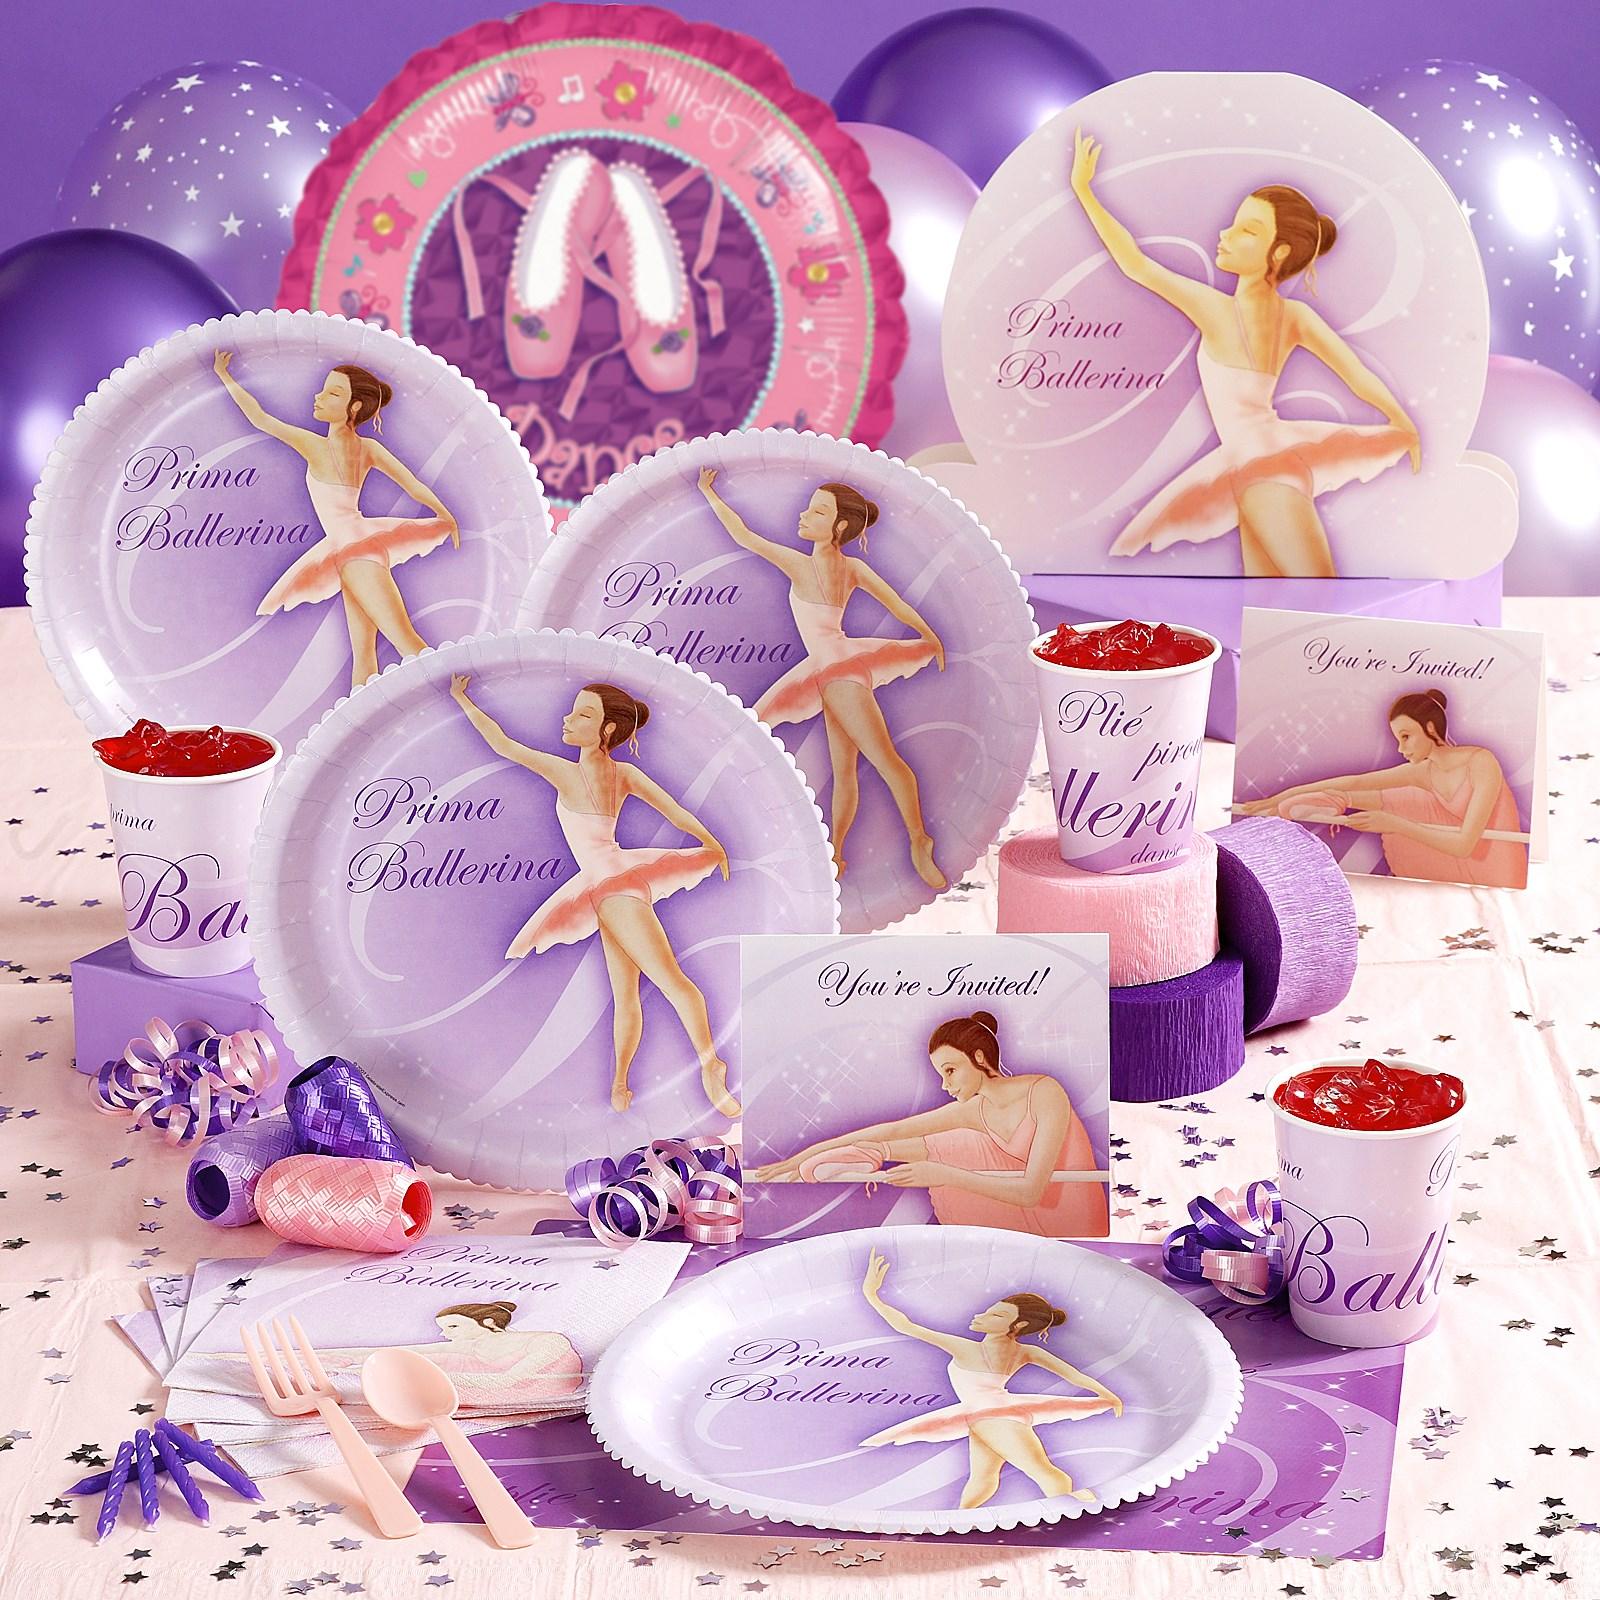 Prima ballerina party supplies for Ballerina party decoration